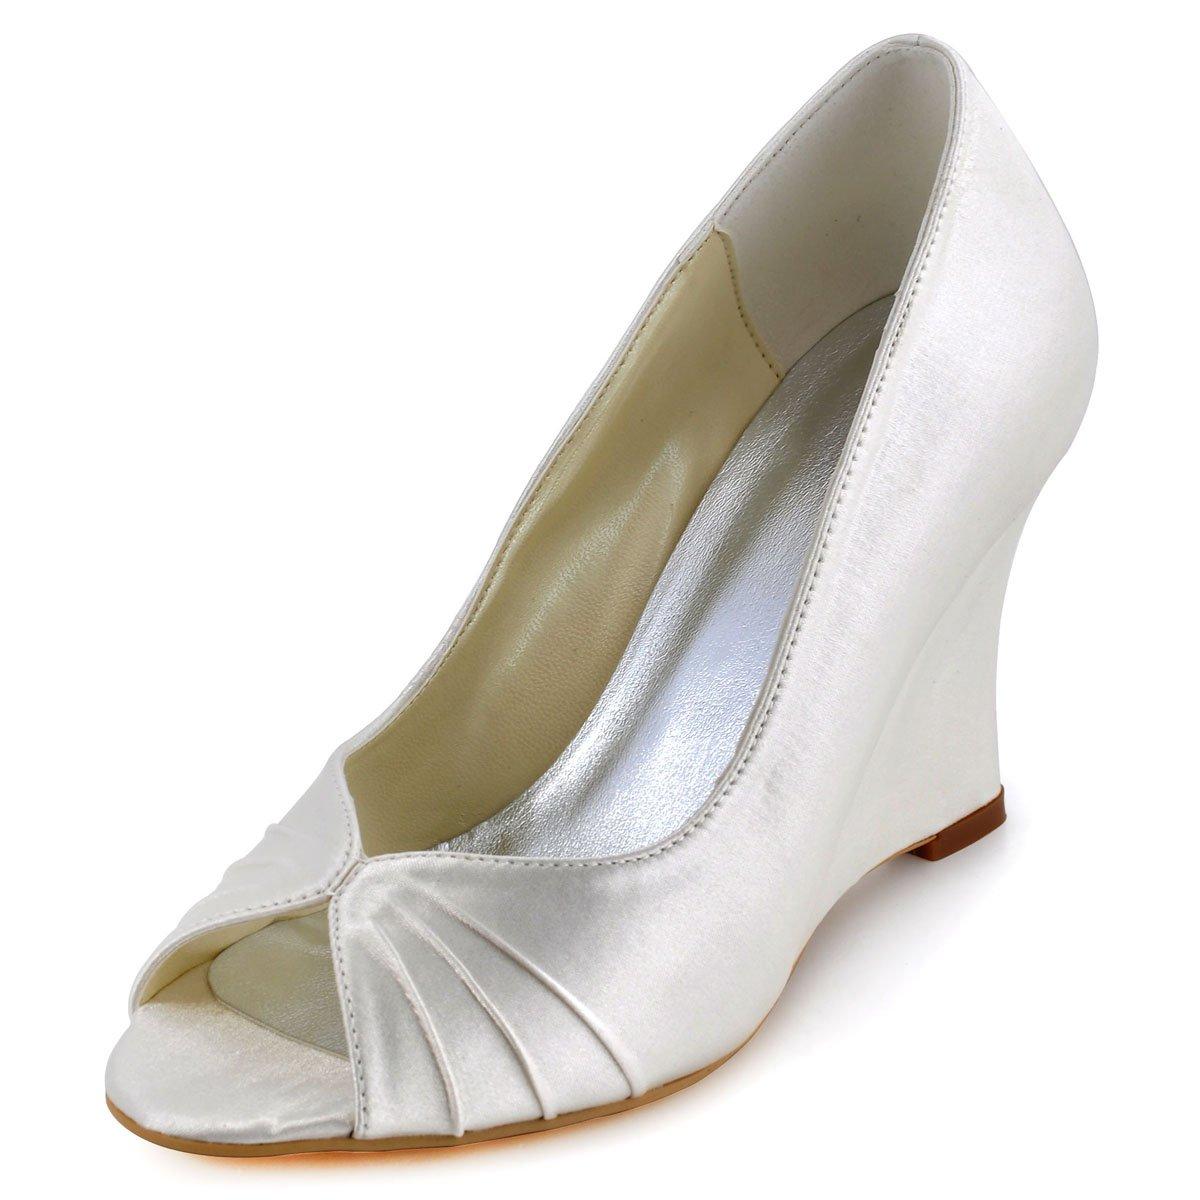 ElegantPark EP2009 Women High Heel Pumps Peep toe Pleated Satin Bridal Wedding Wedges Ivory US 9